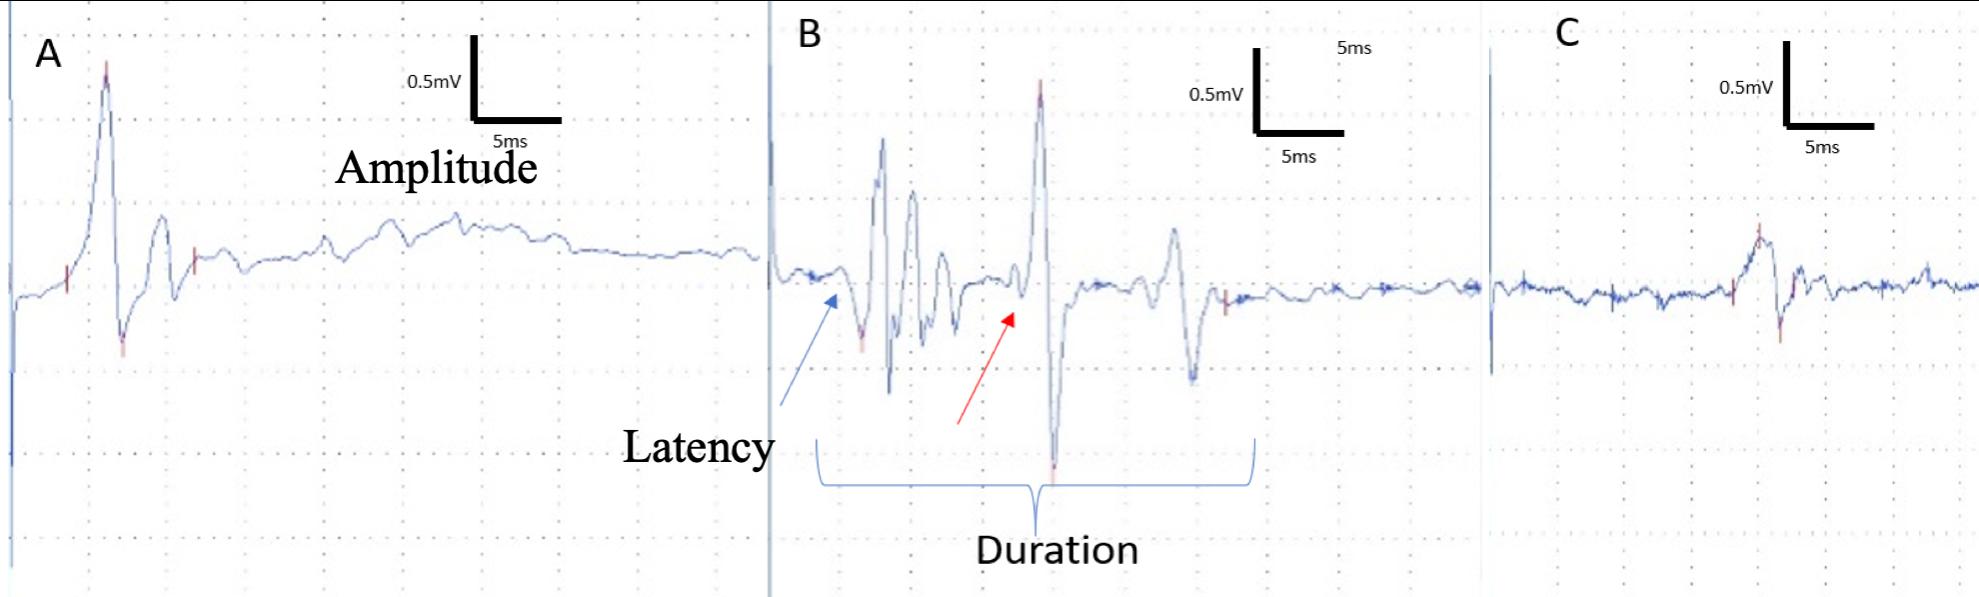 electropysiology recording